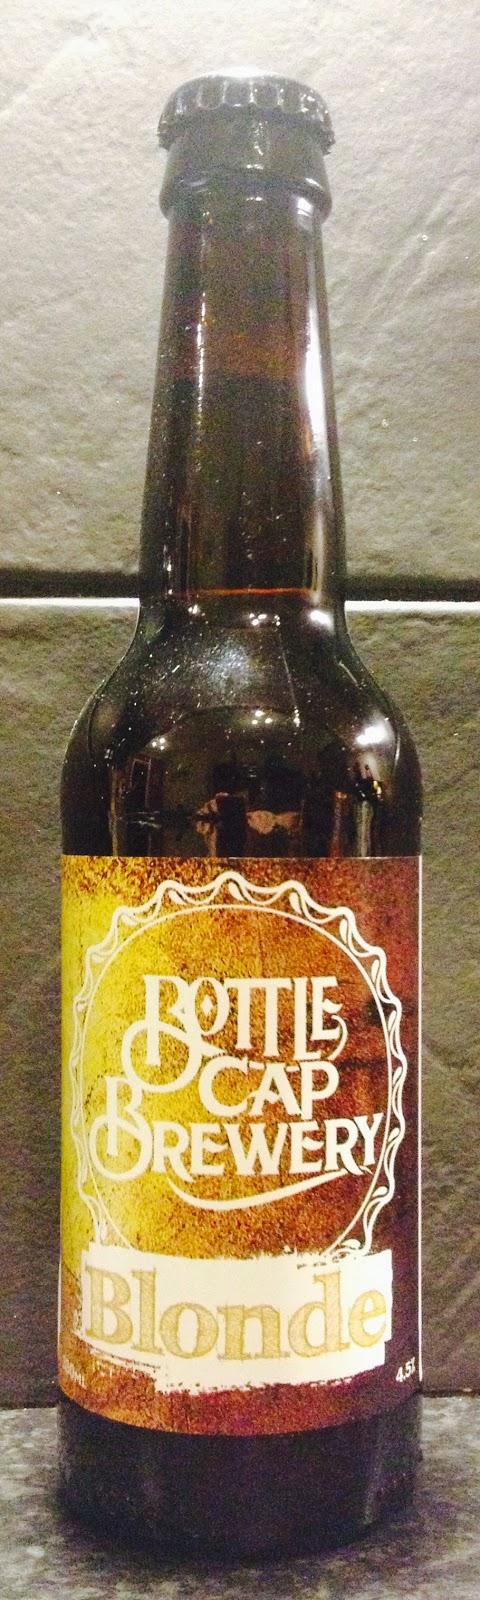 Blonde (Bottle Cap Brewery)